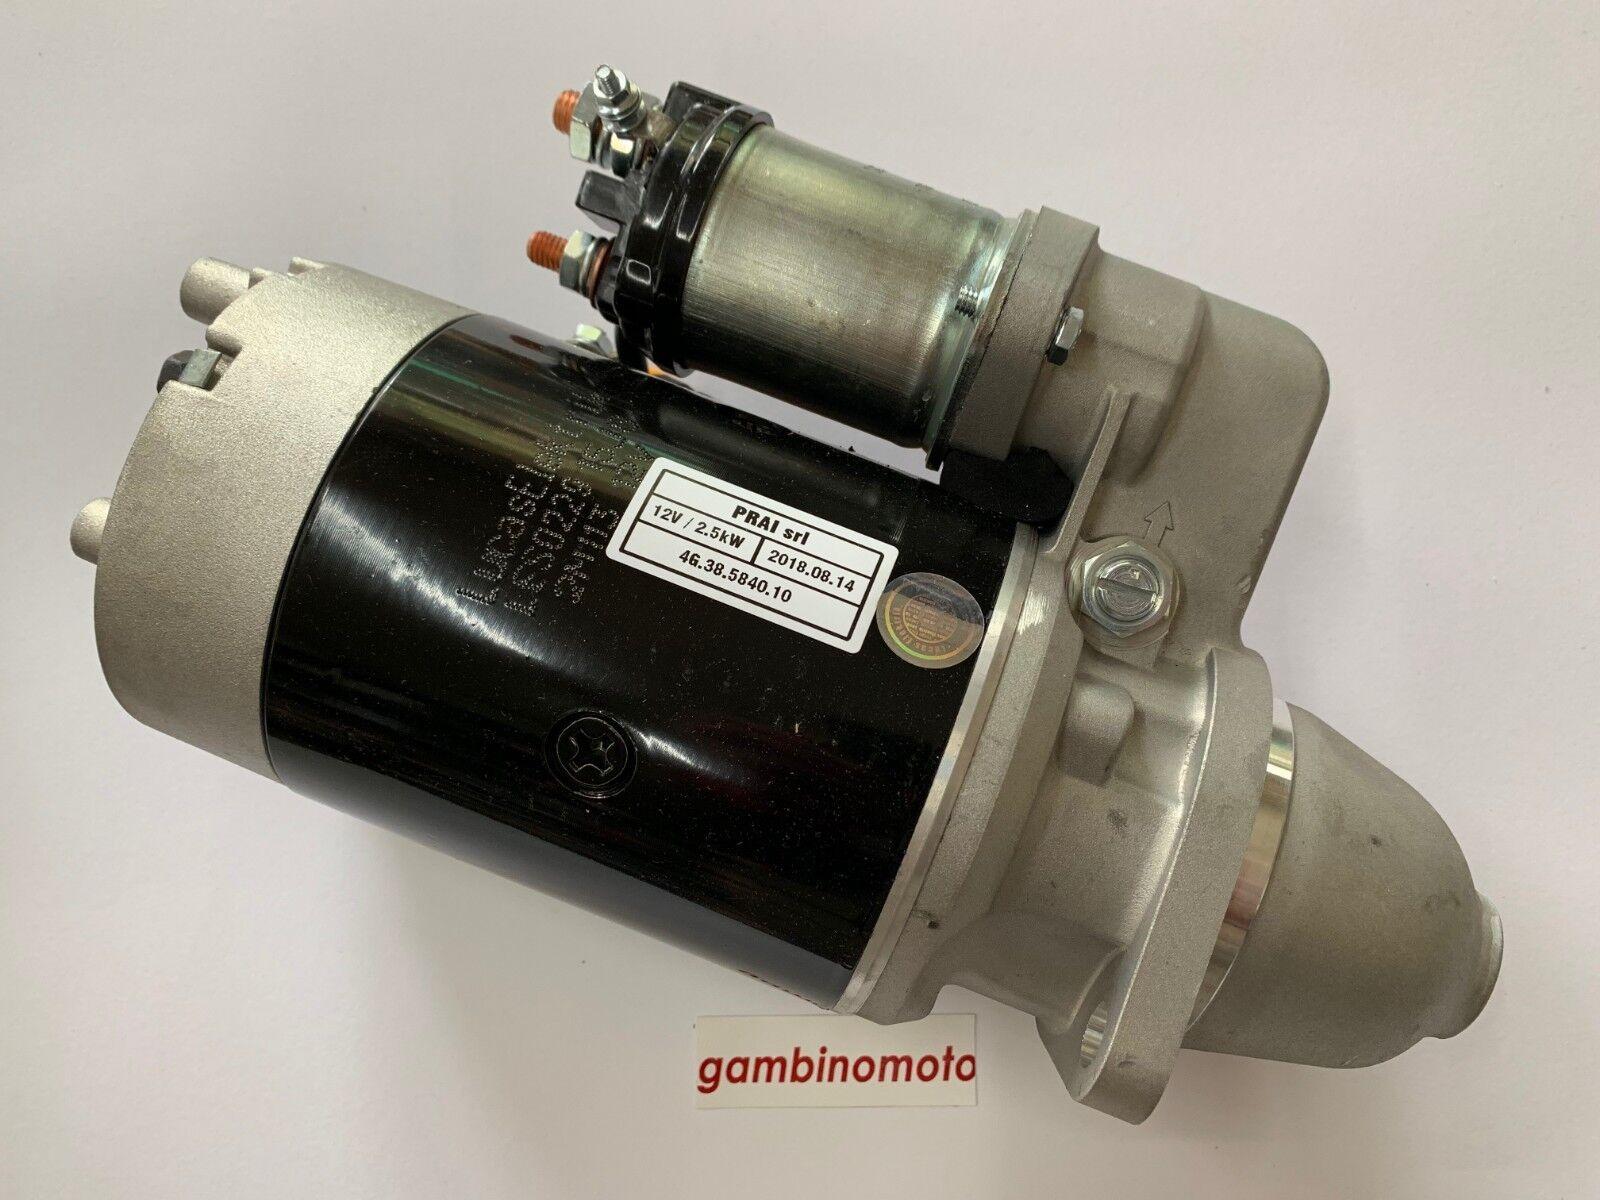 MOTORINO AVVIAMENTO ELETTRICO LOMBARDINI 4LD-LDA91-LDA96 12V-2,5 KW 9 DENTI